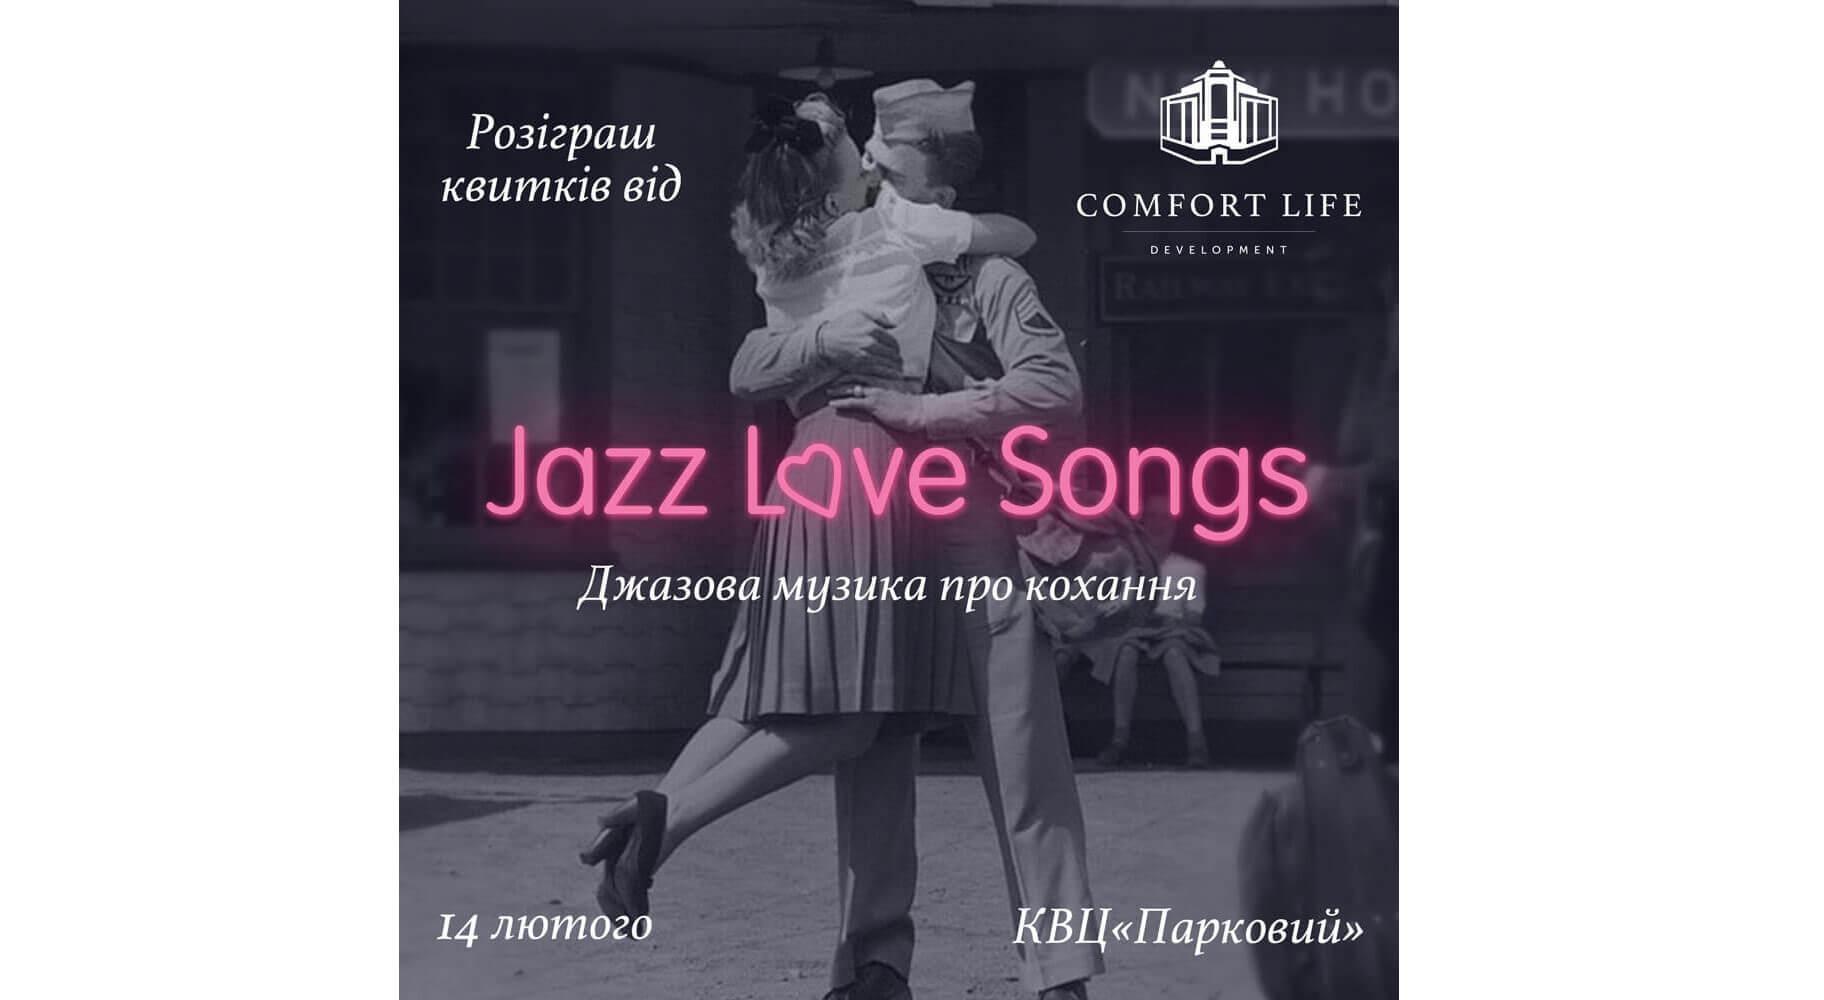 Comfort Life Development дарит 2 билета на «Jazz Love Songs» ко Дню влюбленных!